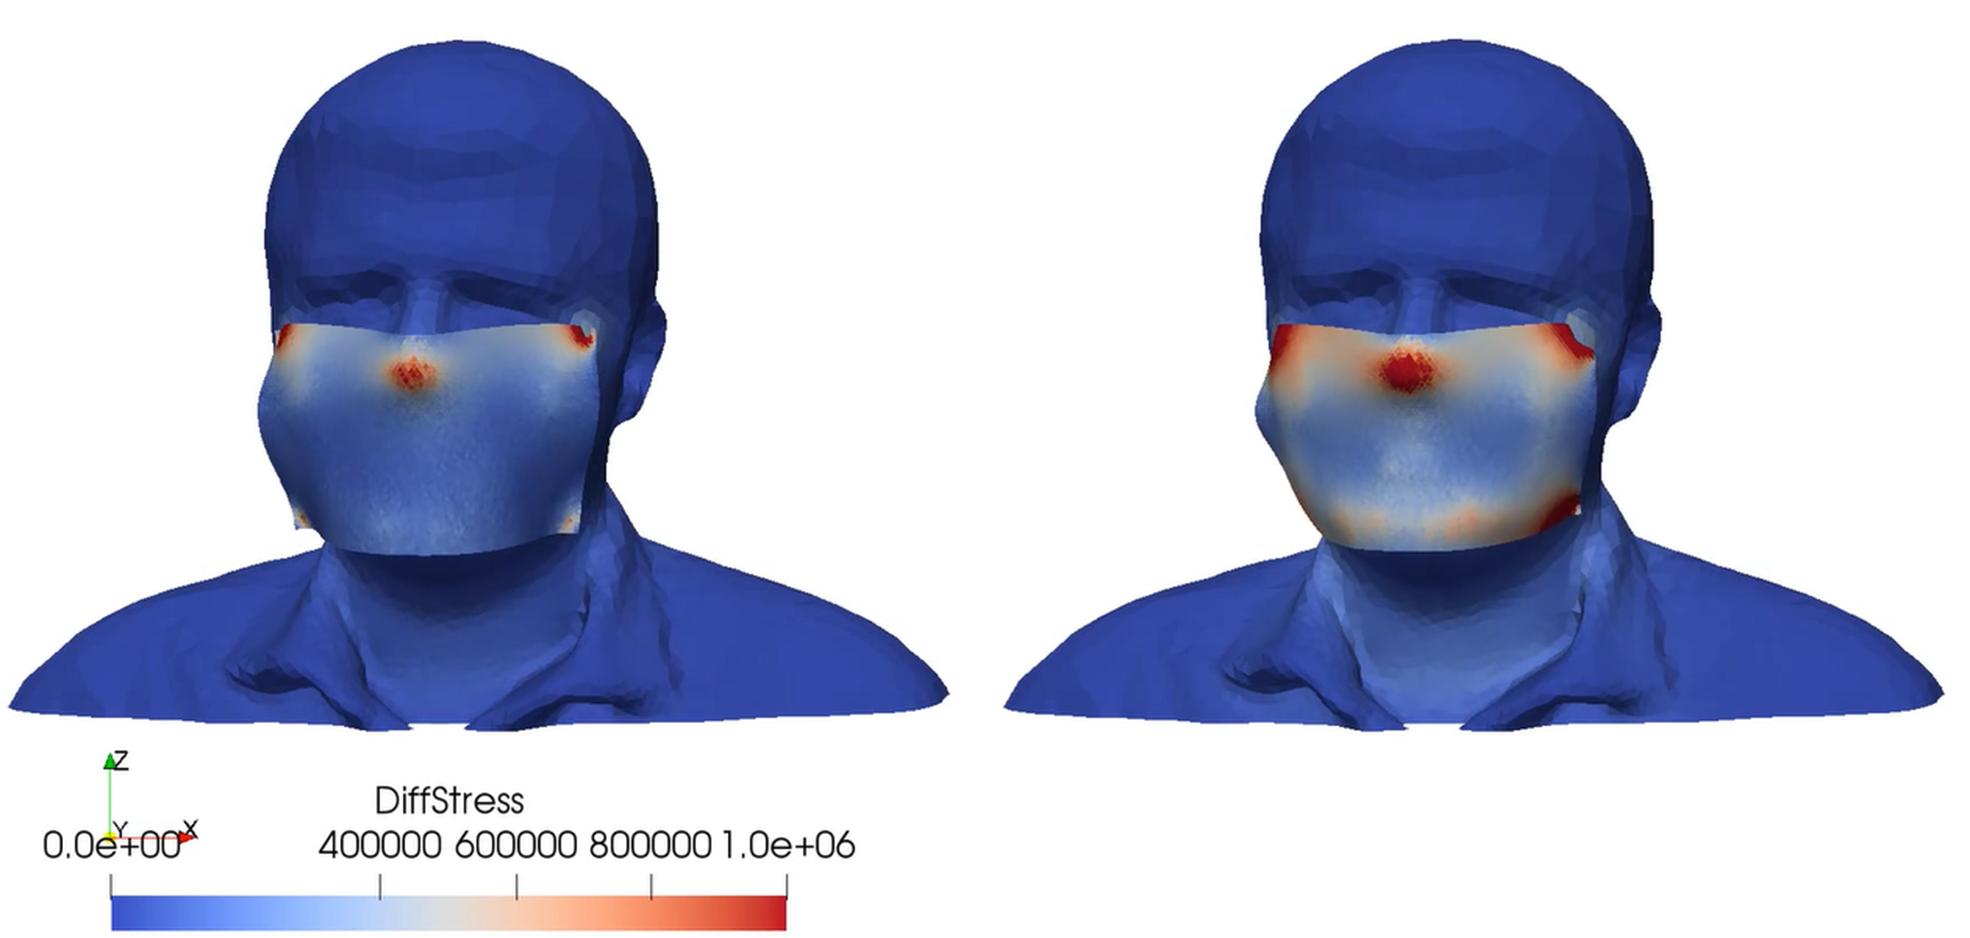 Face mask mechanics and Covid-19 transmission